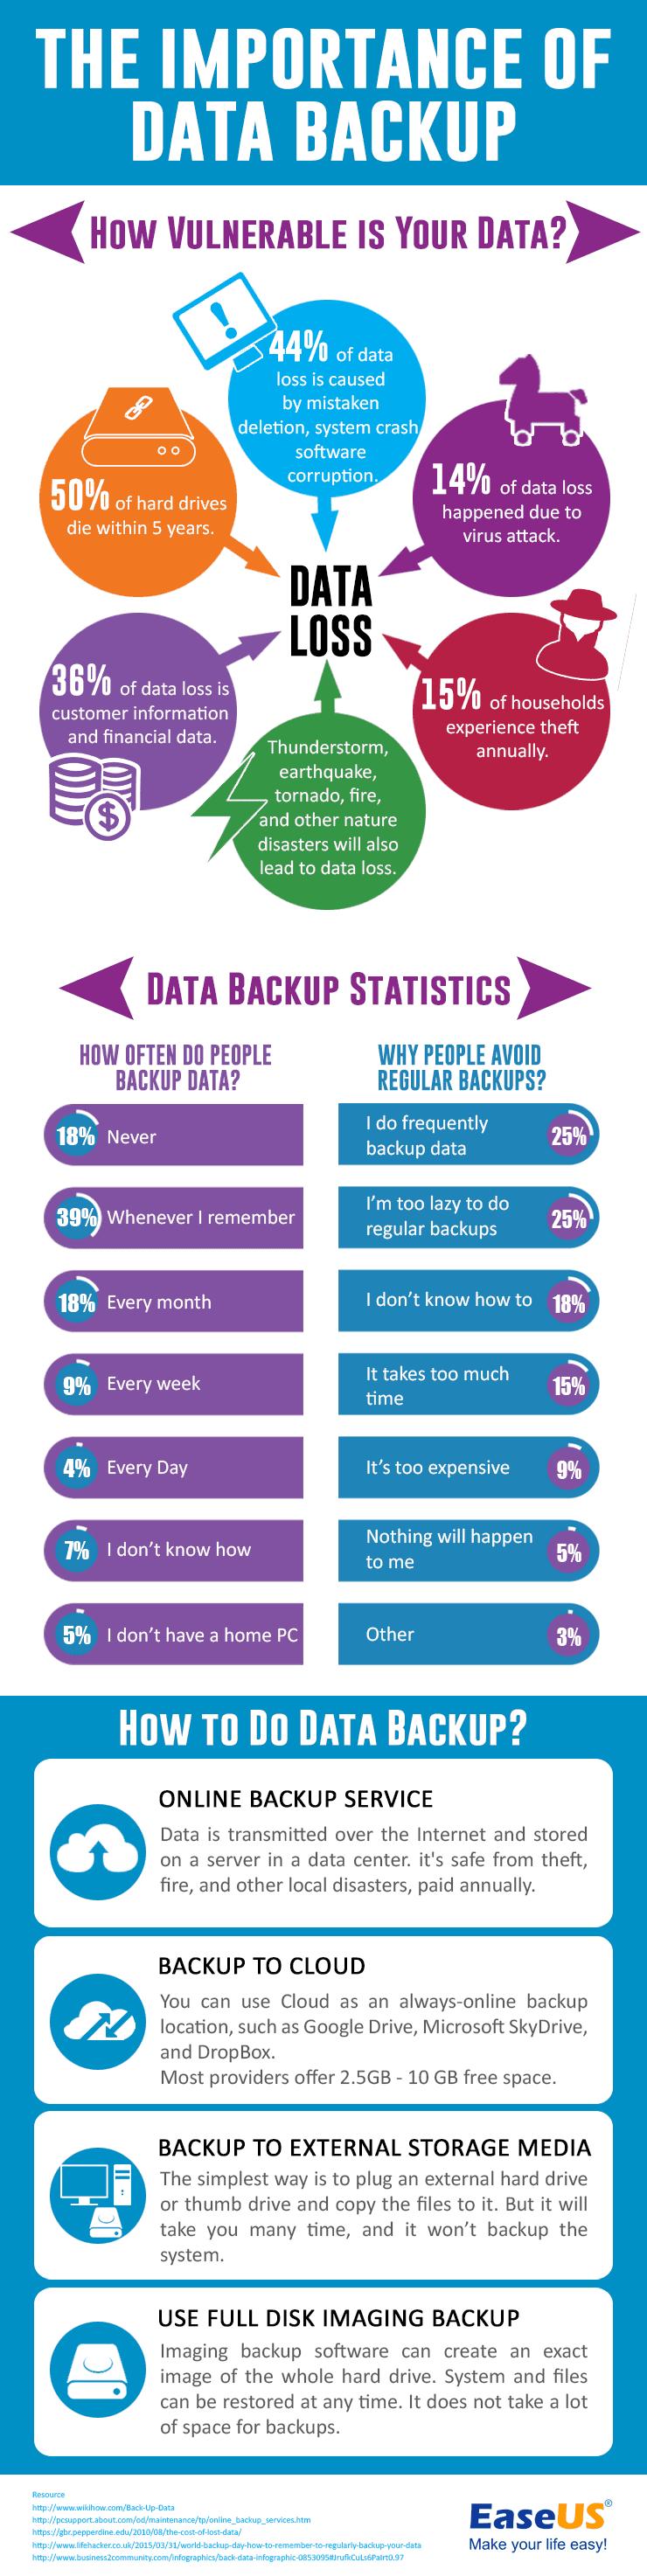 DataBackupFactsandStatistics